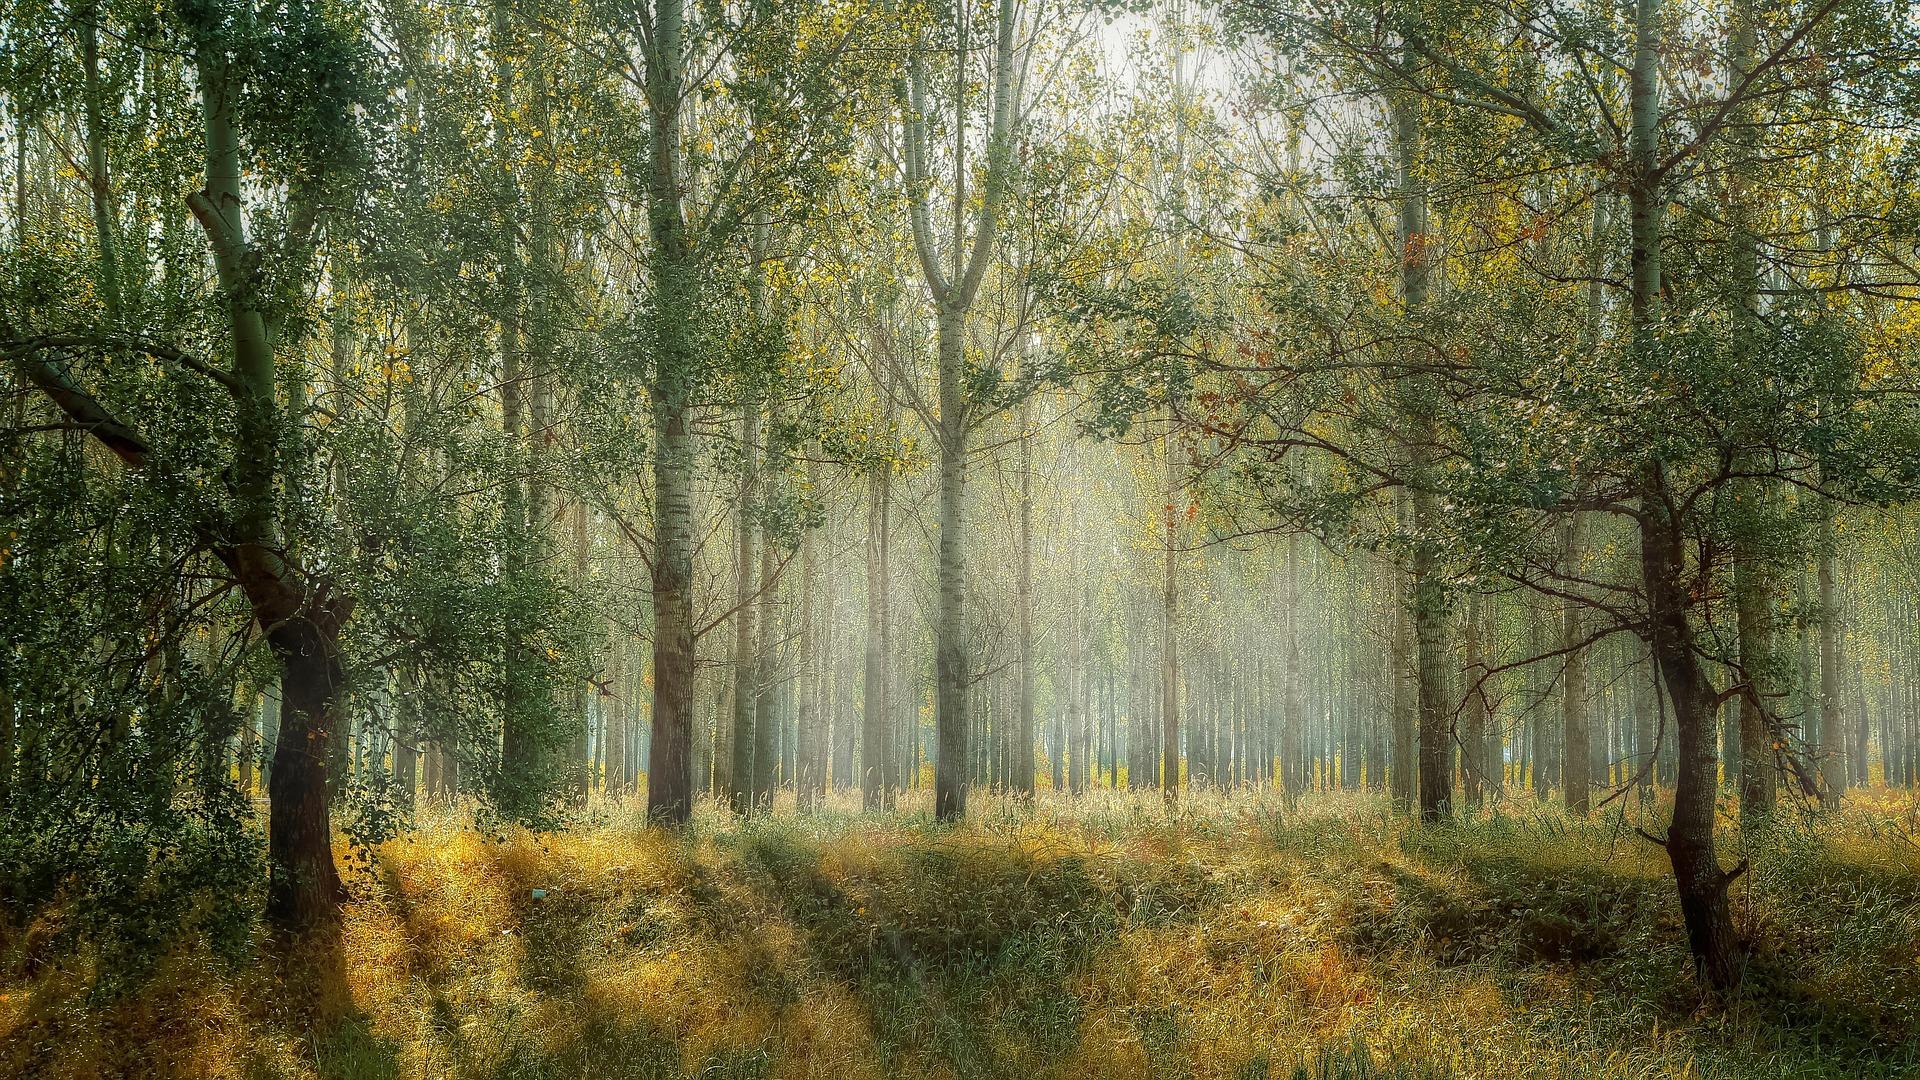 Green Foggy Forest